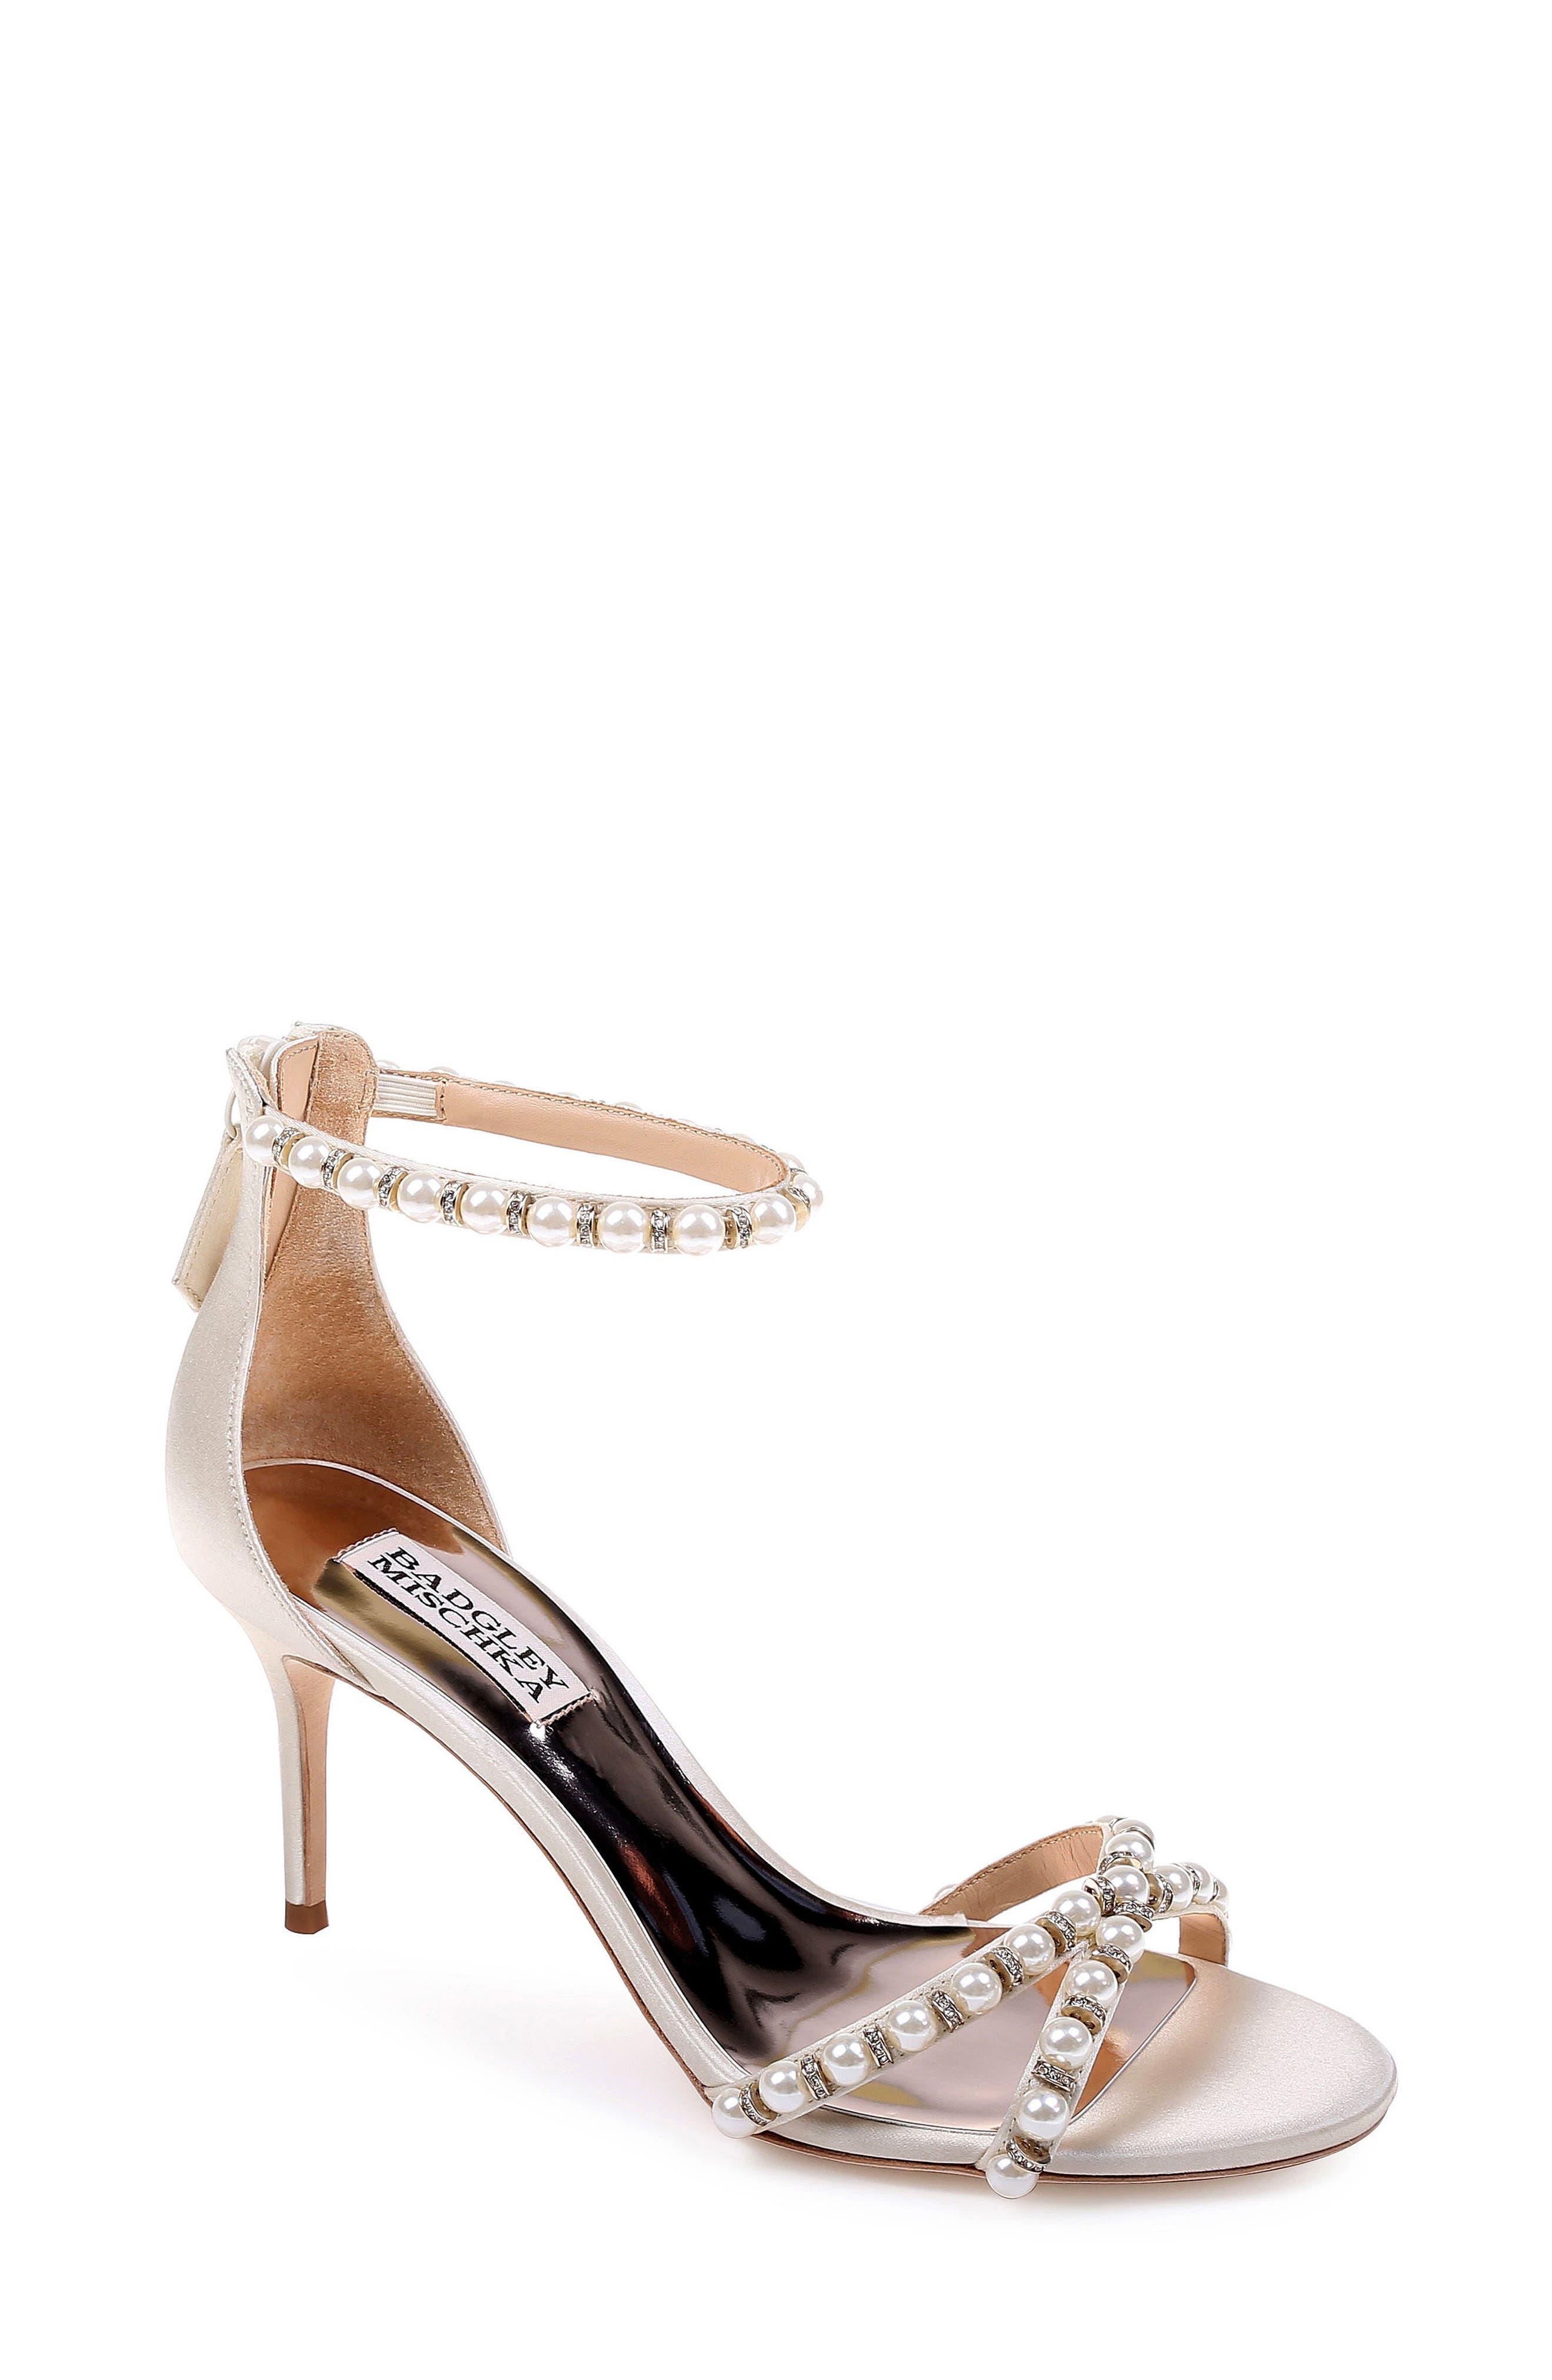 Badgley Mischka Hannah Embellished Ankle Strap Sandal, White